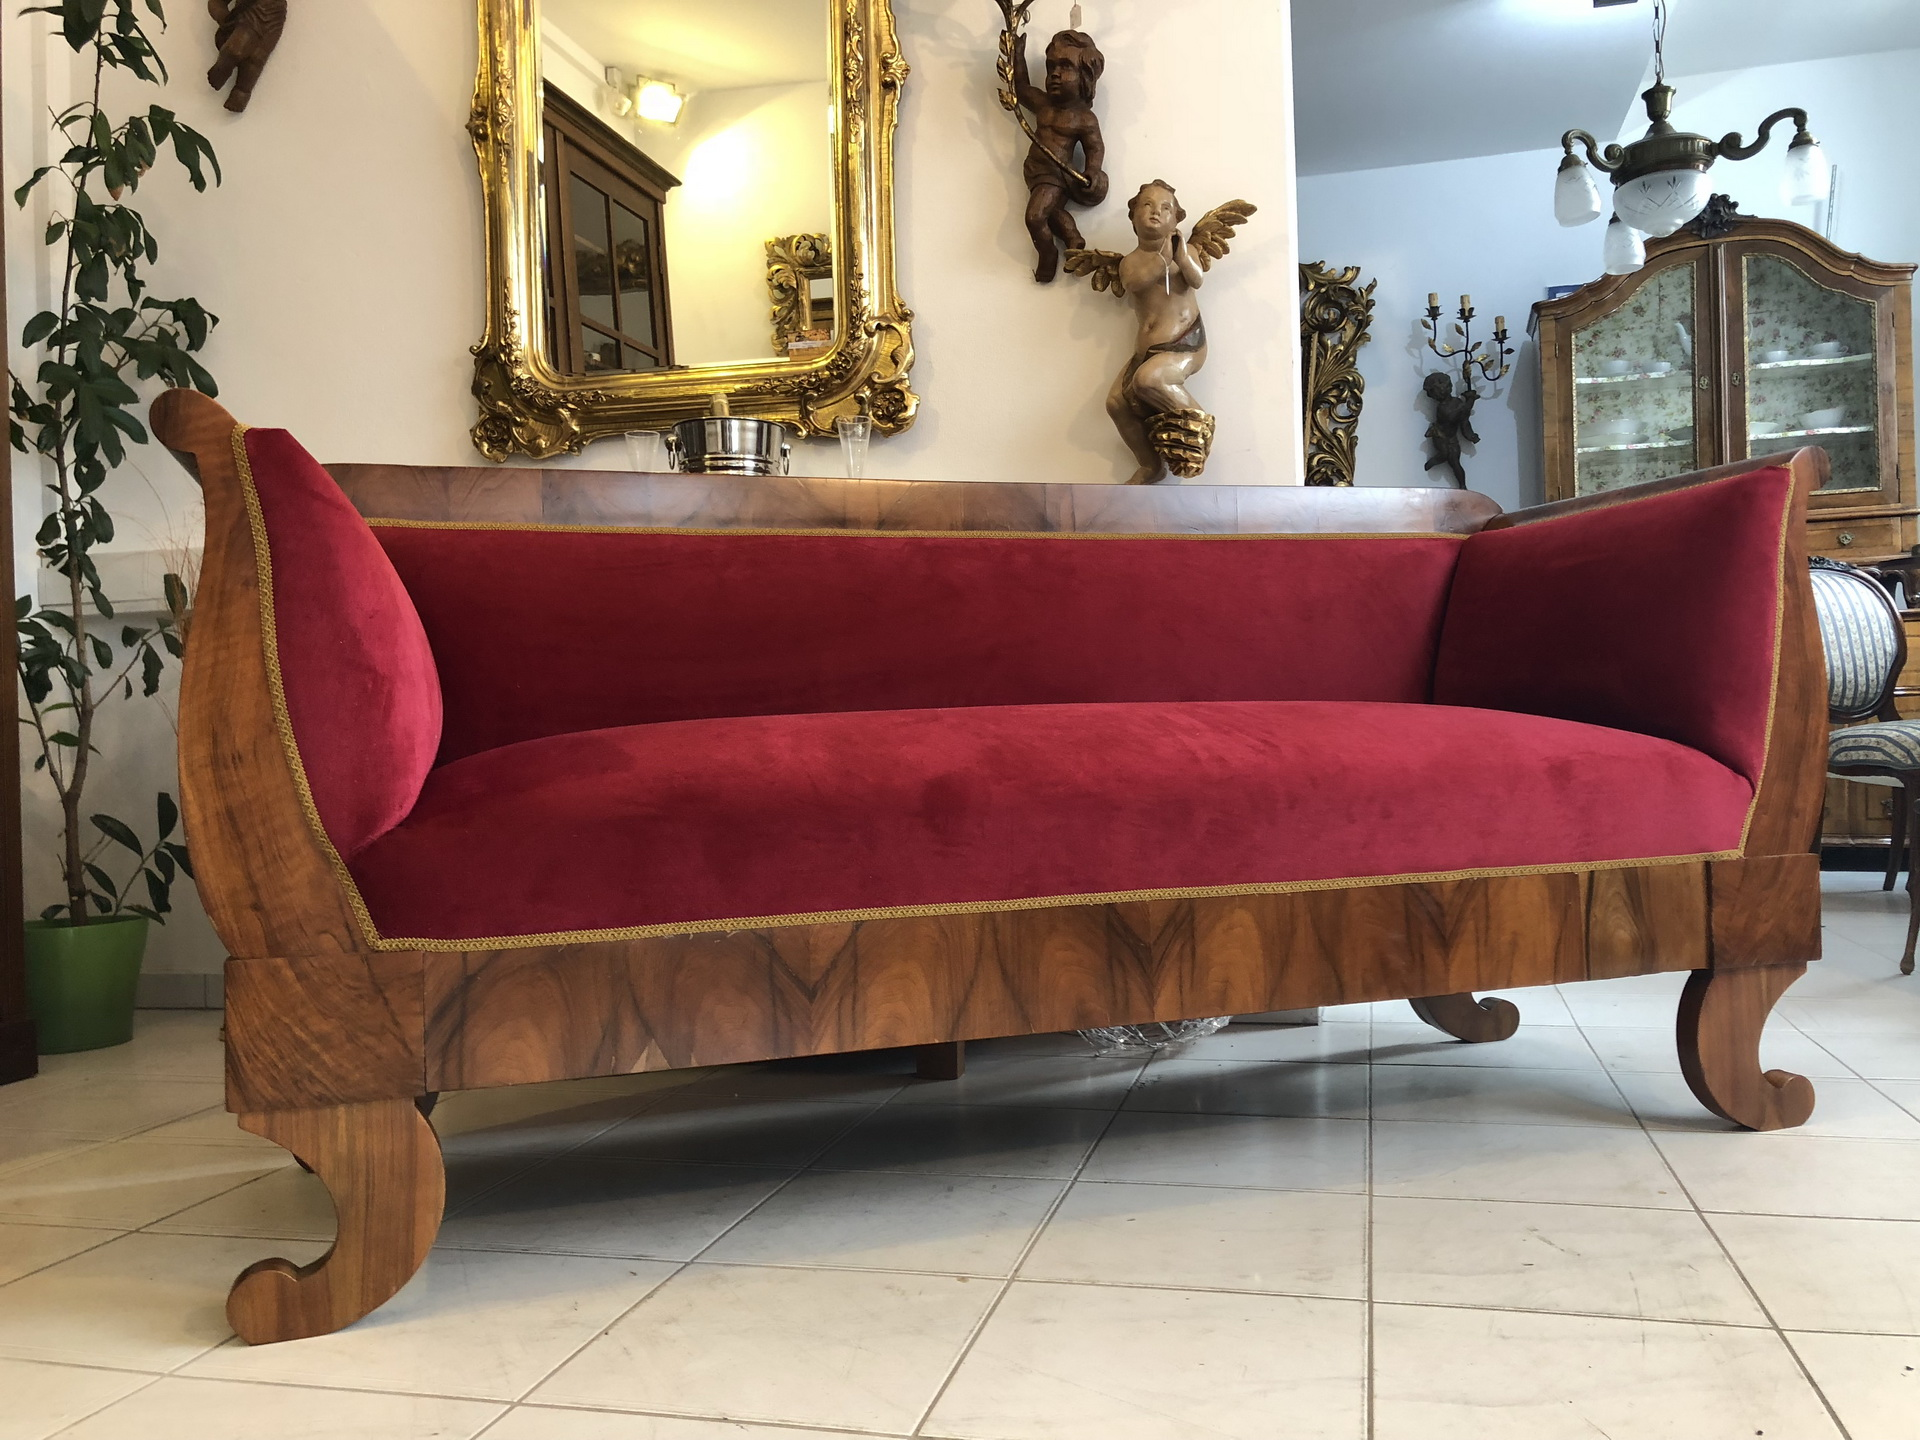 Full Size of Sofa Antik Stil Couch Gebraucht Leder Optik Ledersofa Braun Kaufen Look Bali Antiklederoptik Sofas Schweiz Big Restauriertes Originales Biedermeier Nussholz Sofa Sofa Antik